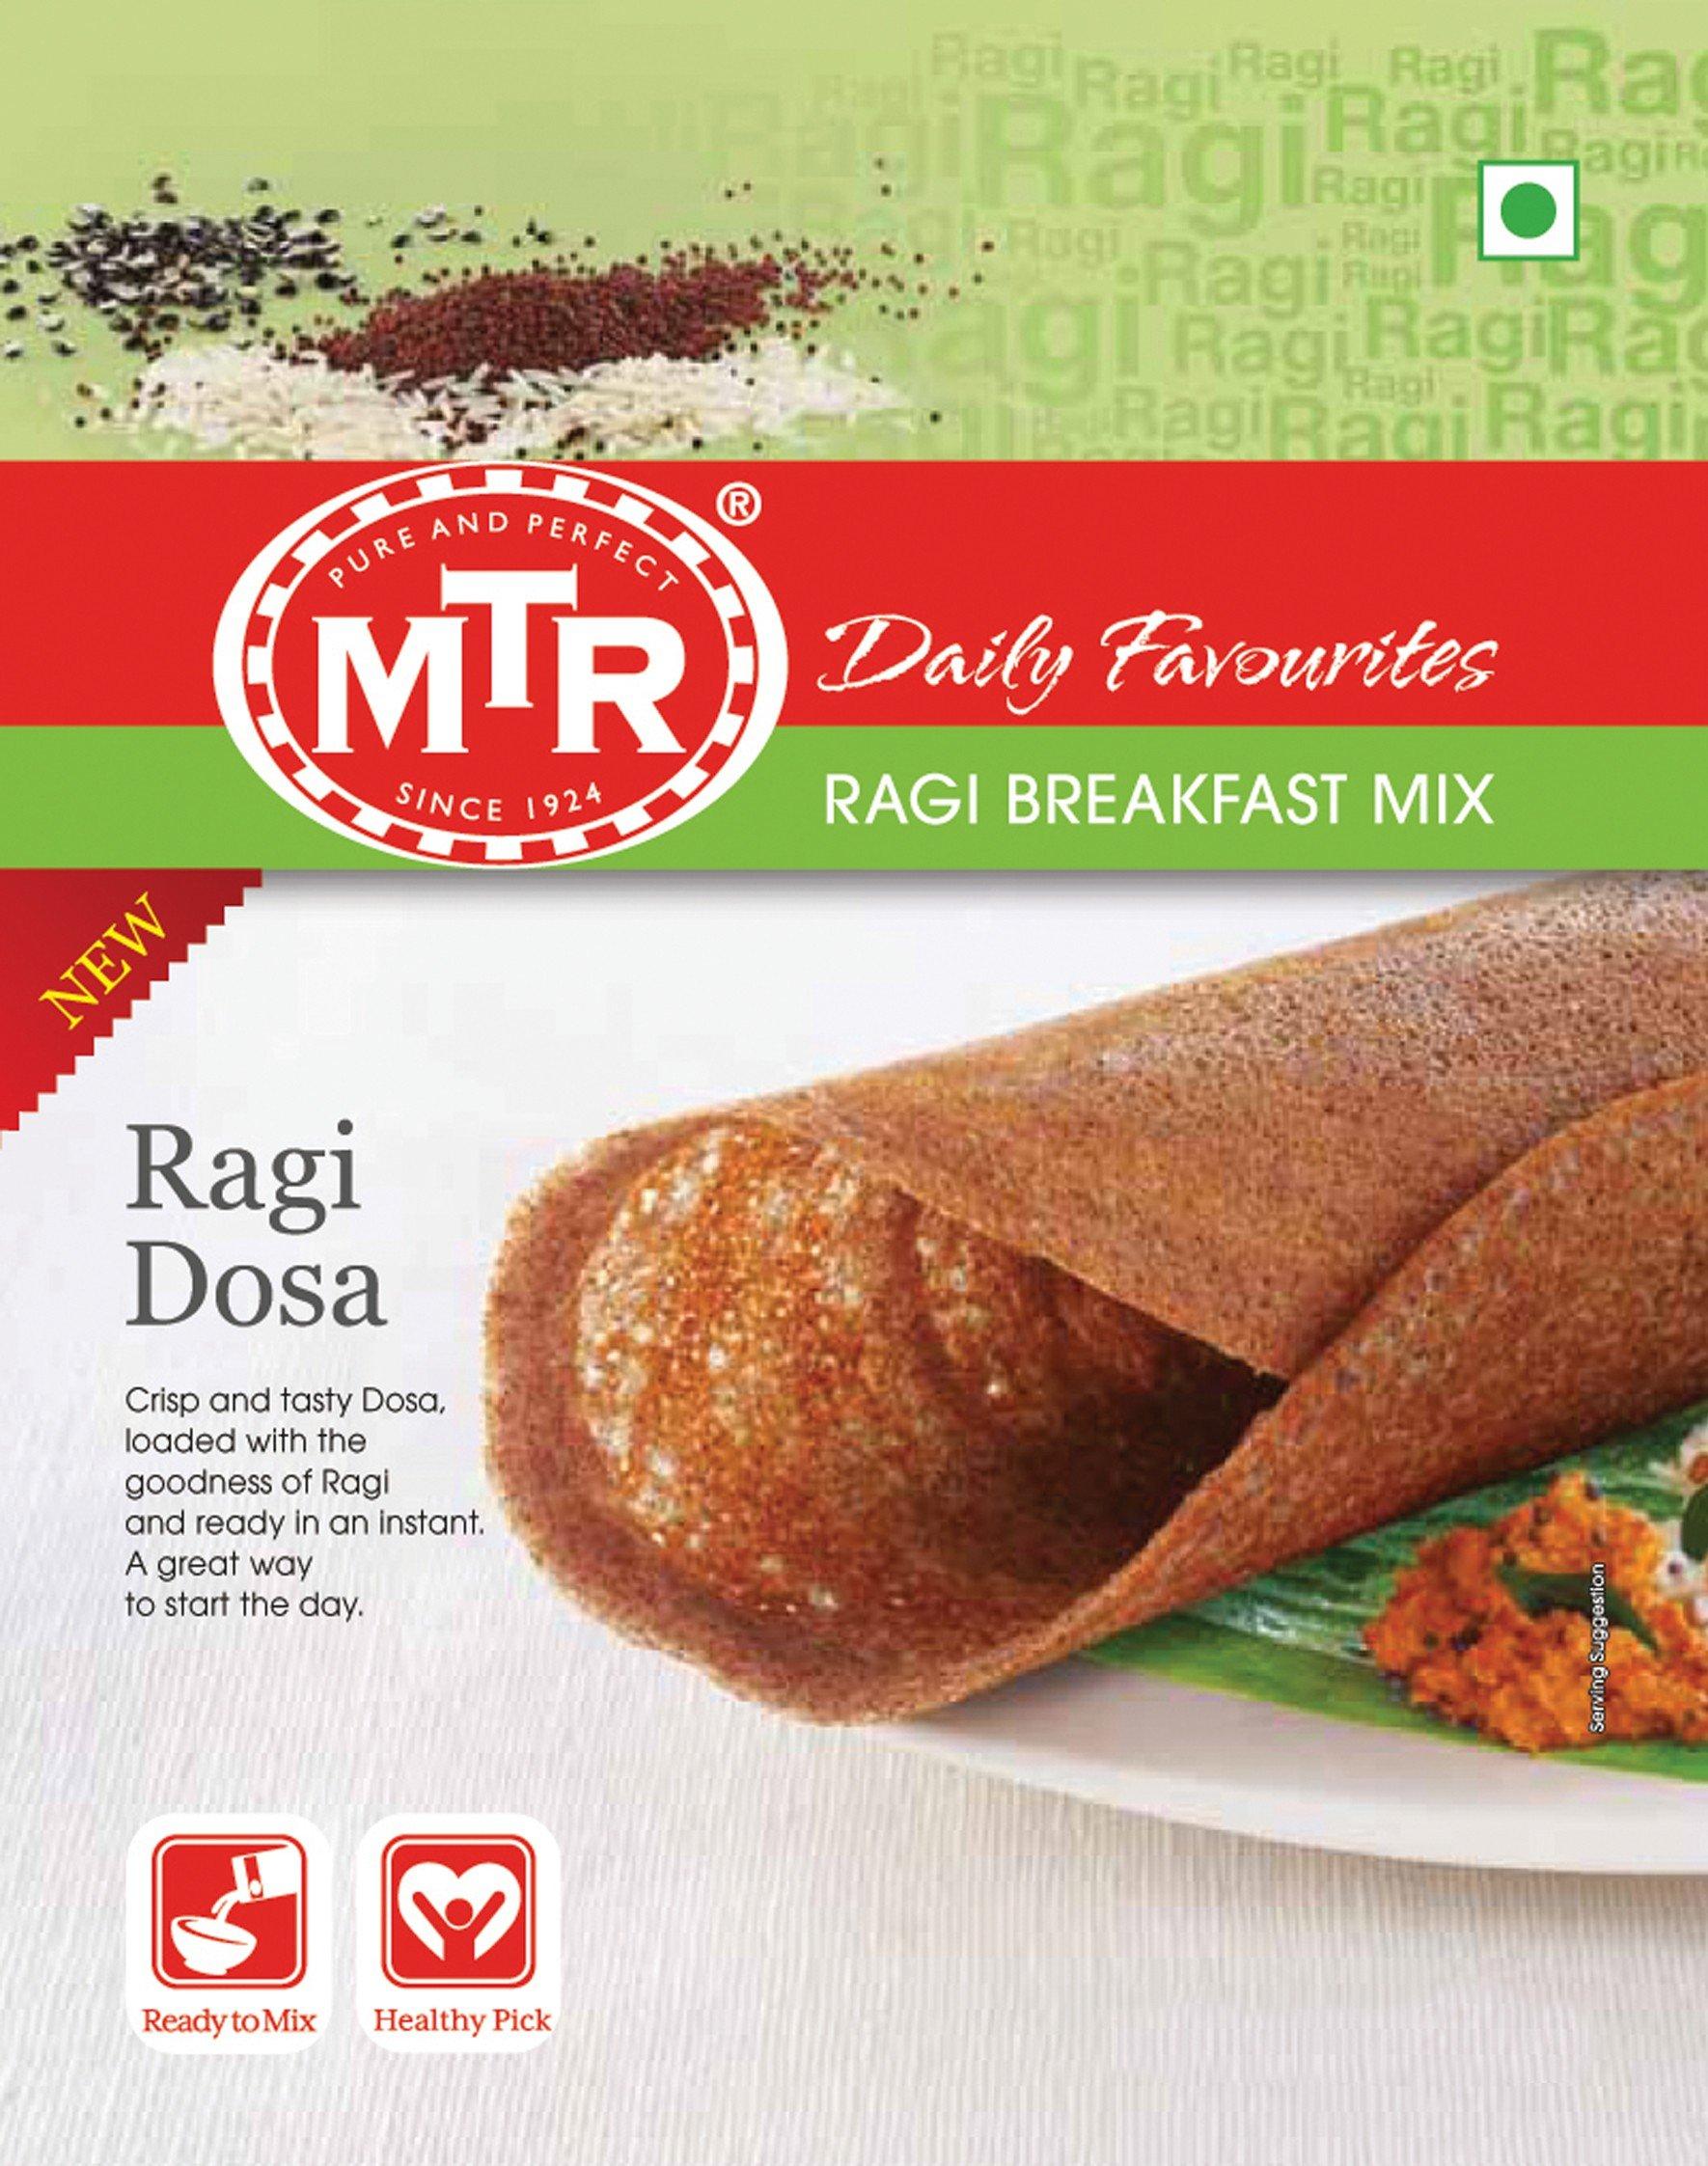 MTR Ragi Dosa Breakfast Mix 500g (1.1lb)